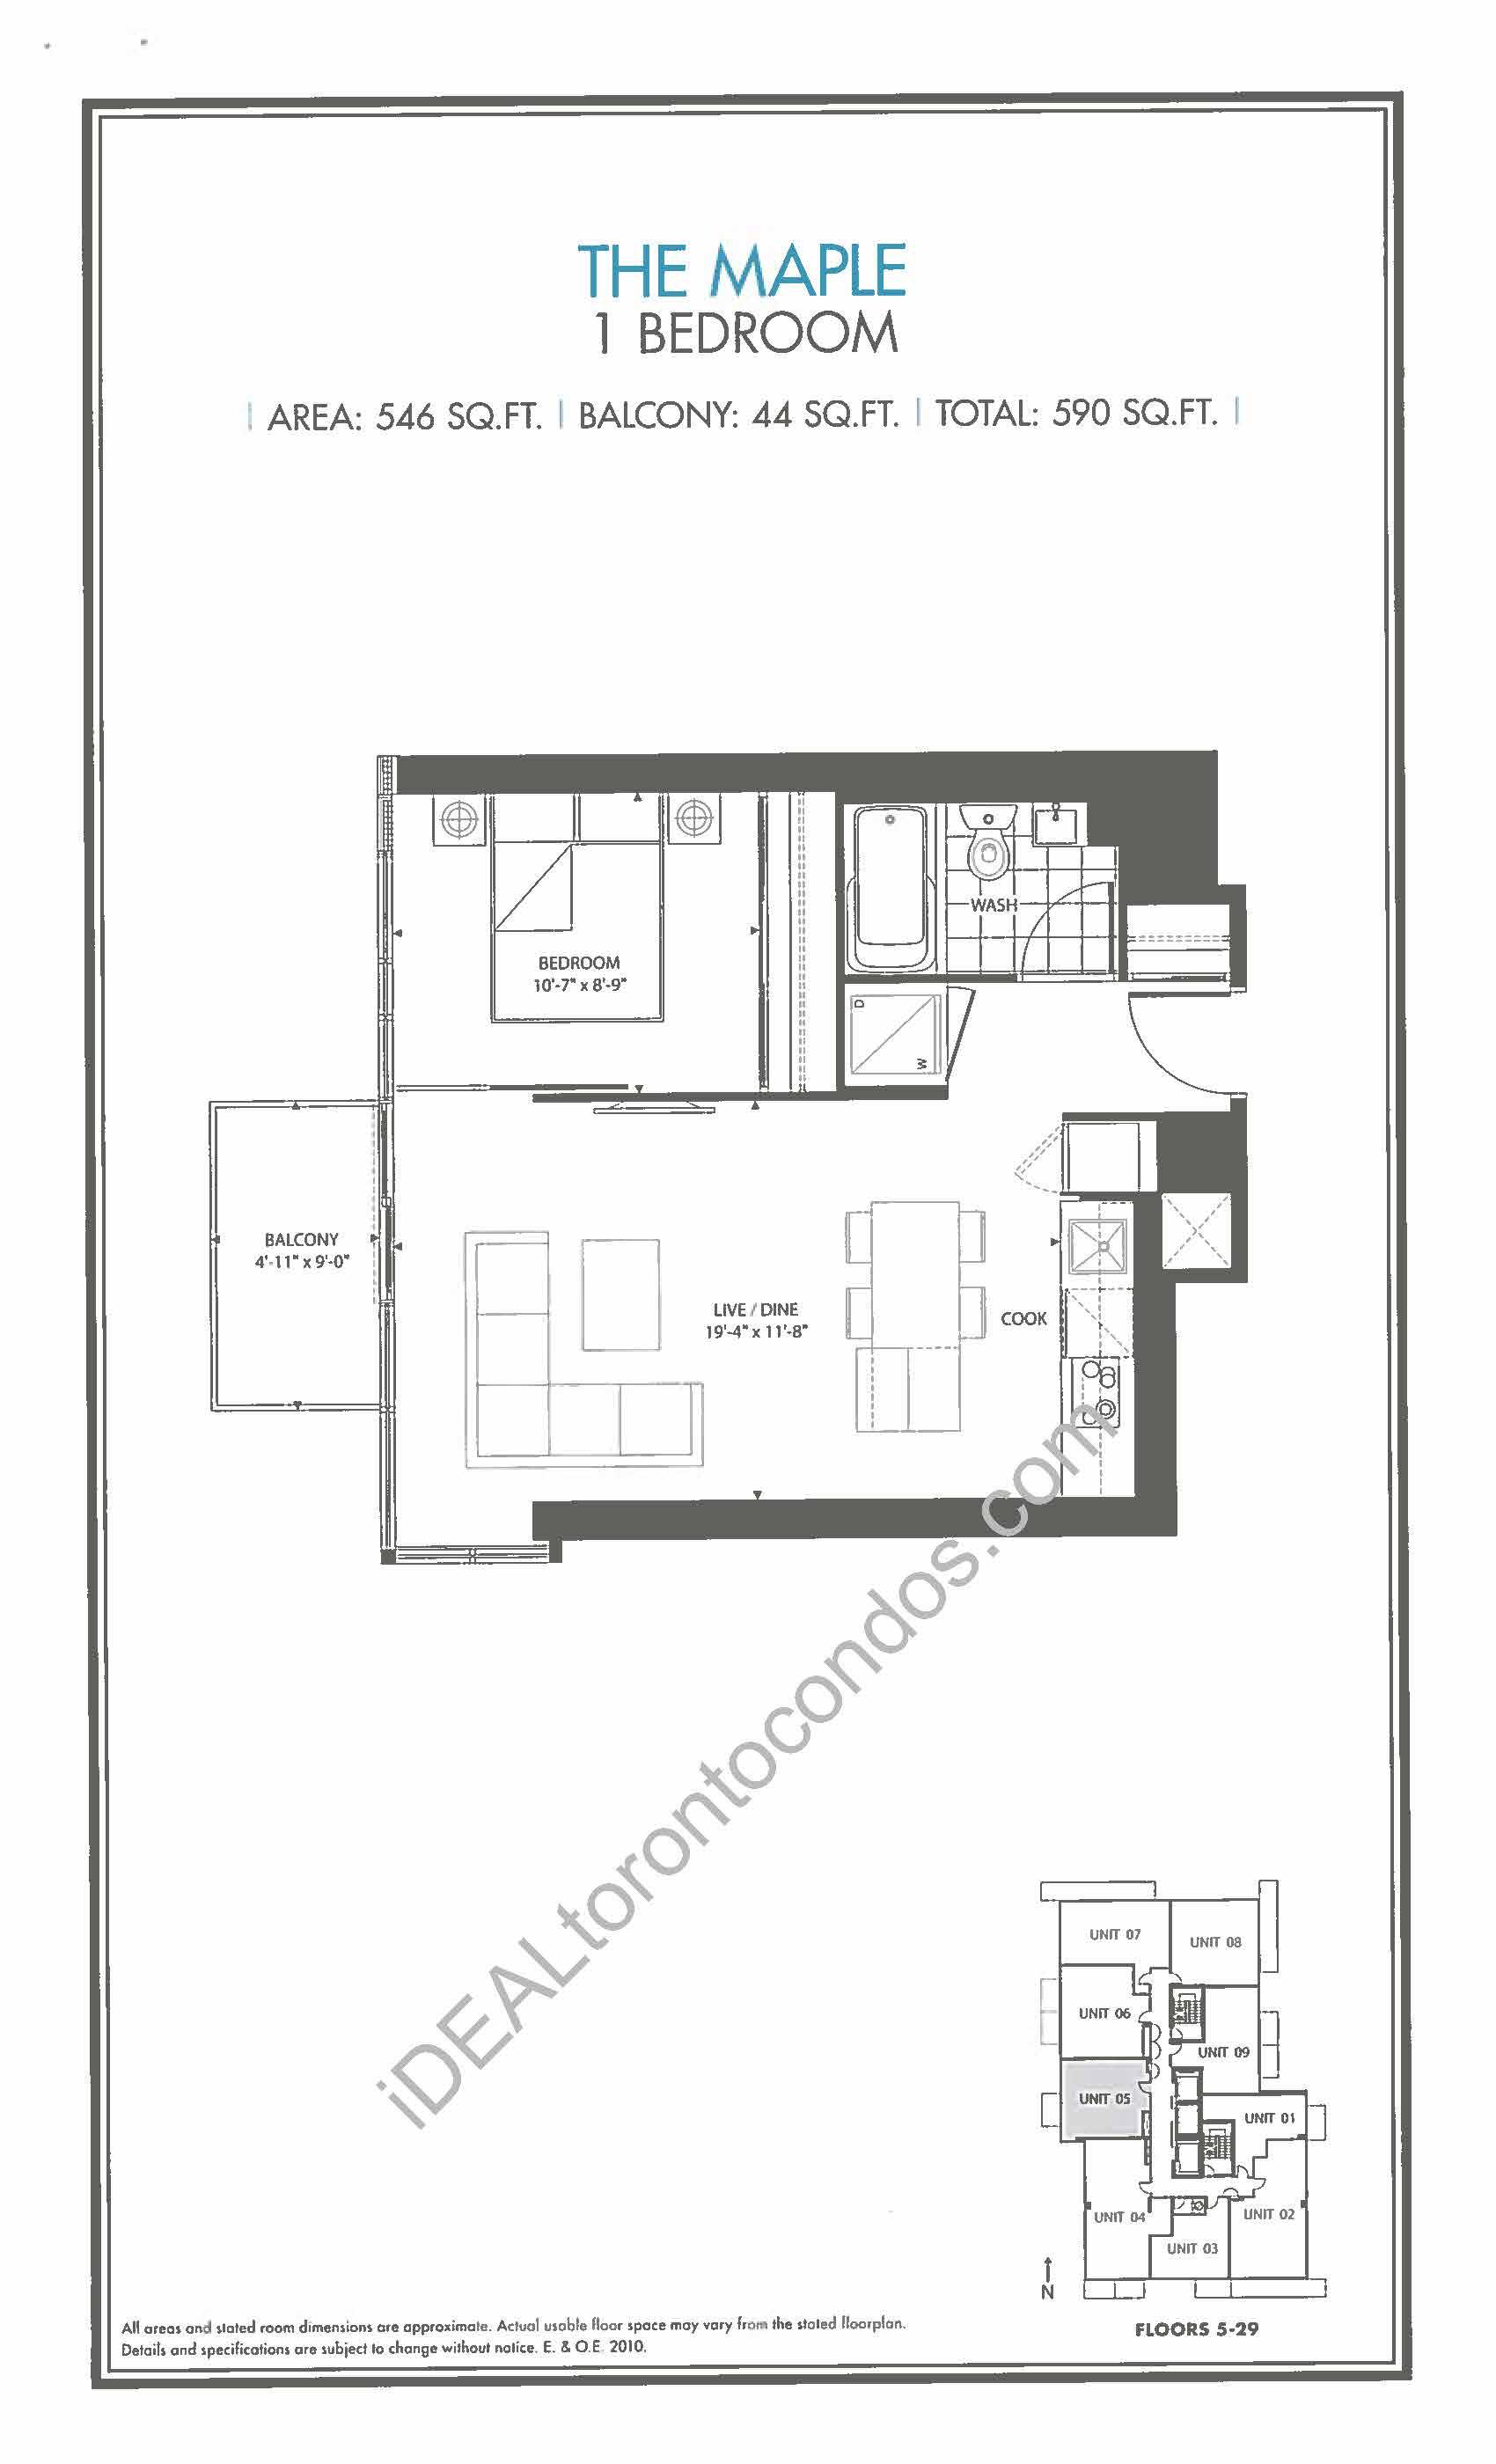 The Maple - 1 Bedroom